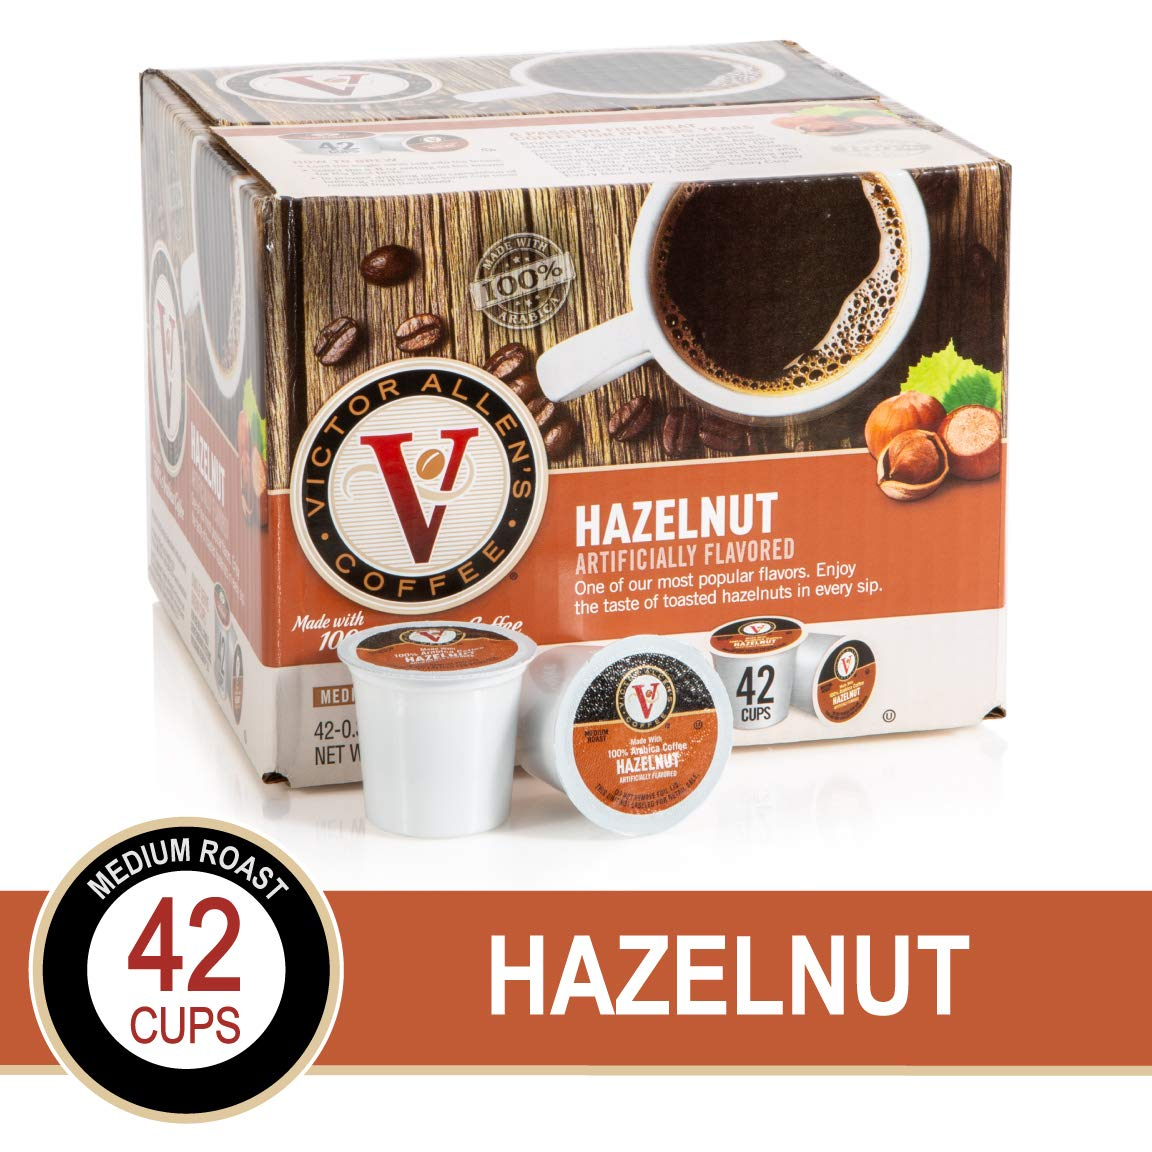 Hazelnut for K-Cup Keurig 2.0 Brewers, 42 Count, Victor Allen's Coffee Medium Roast Single Serve Coffee Pods by Victor Allen